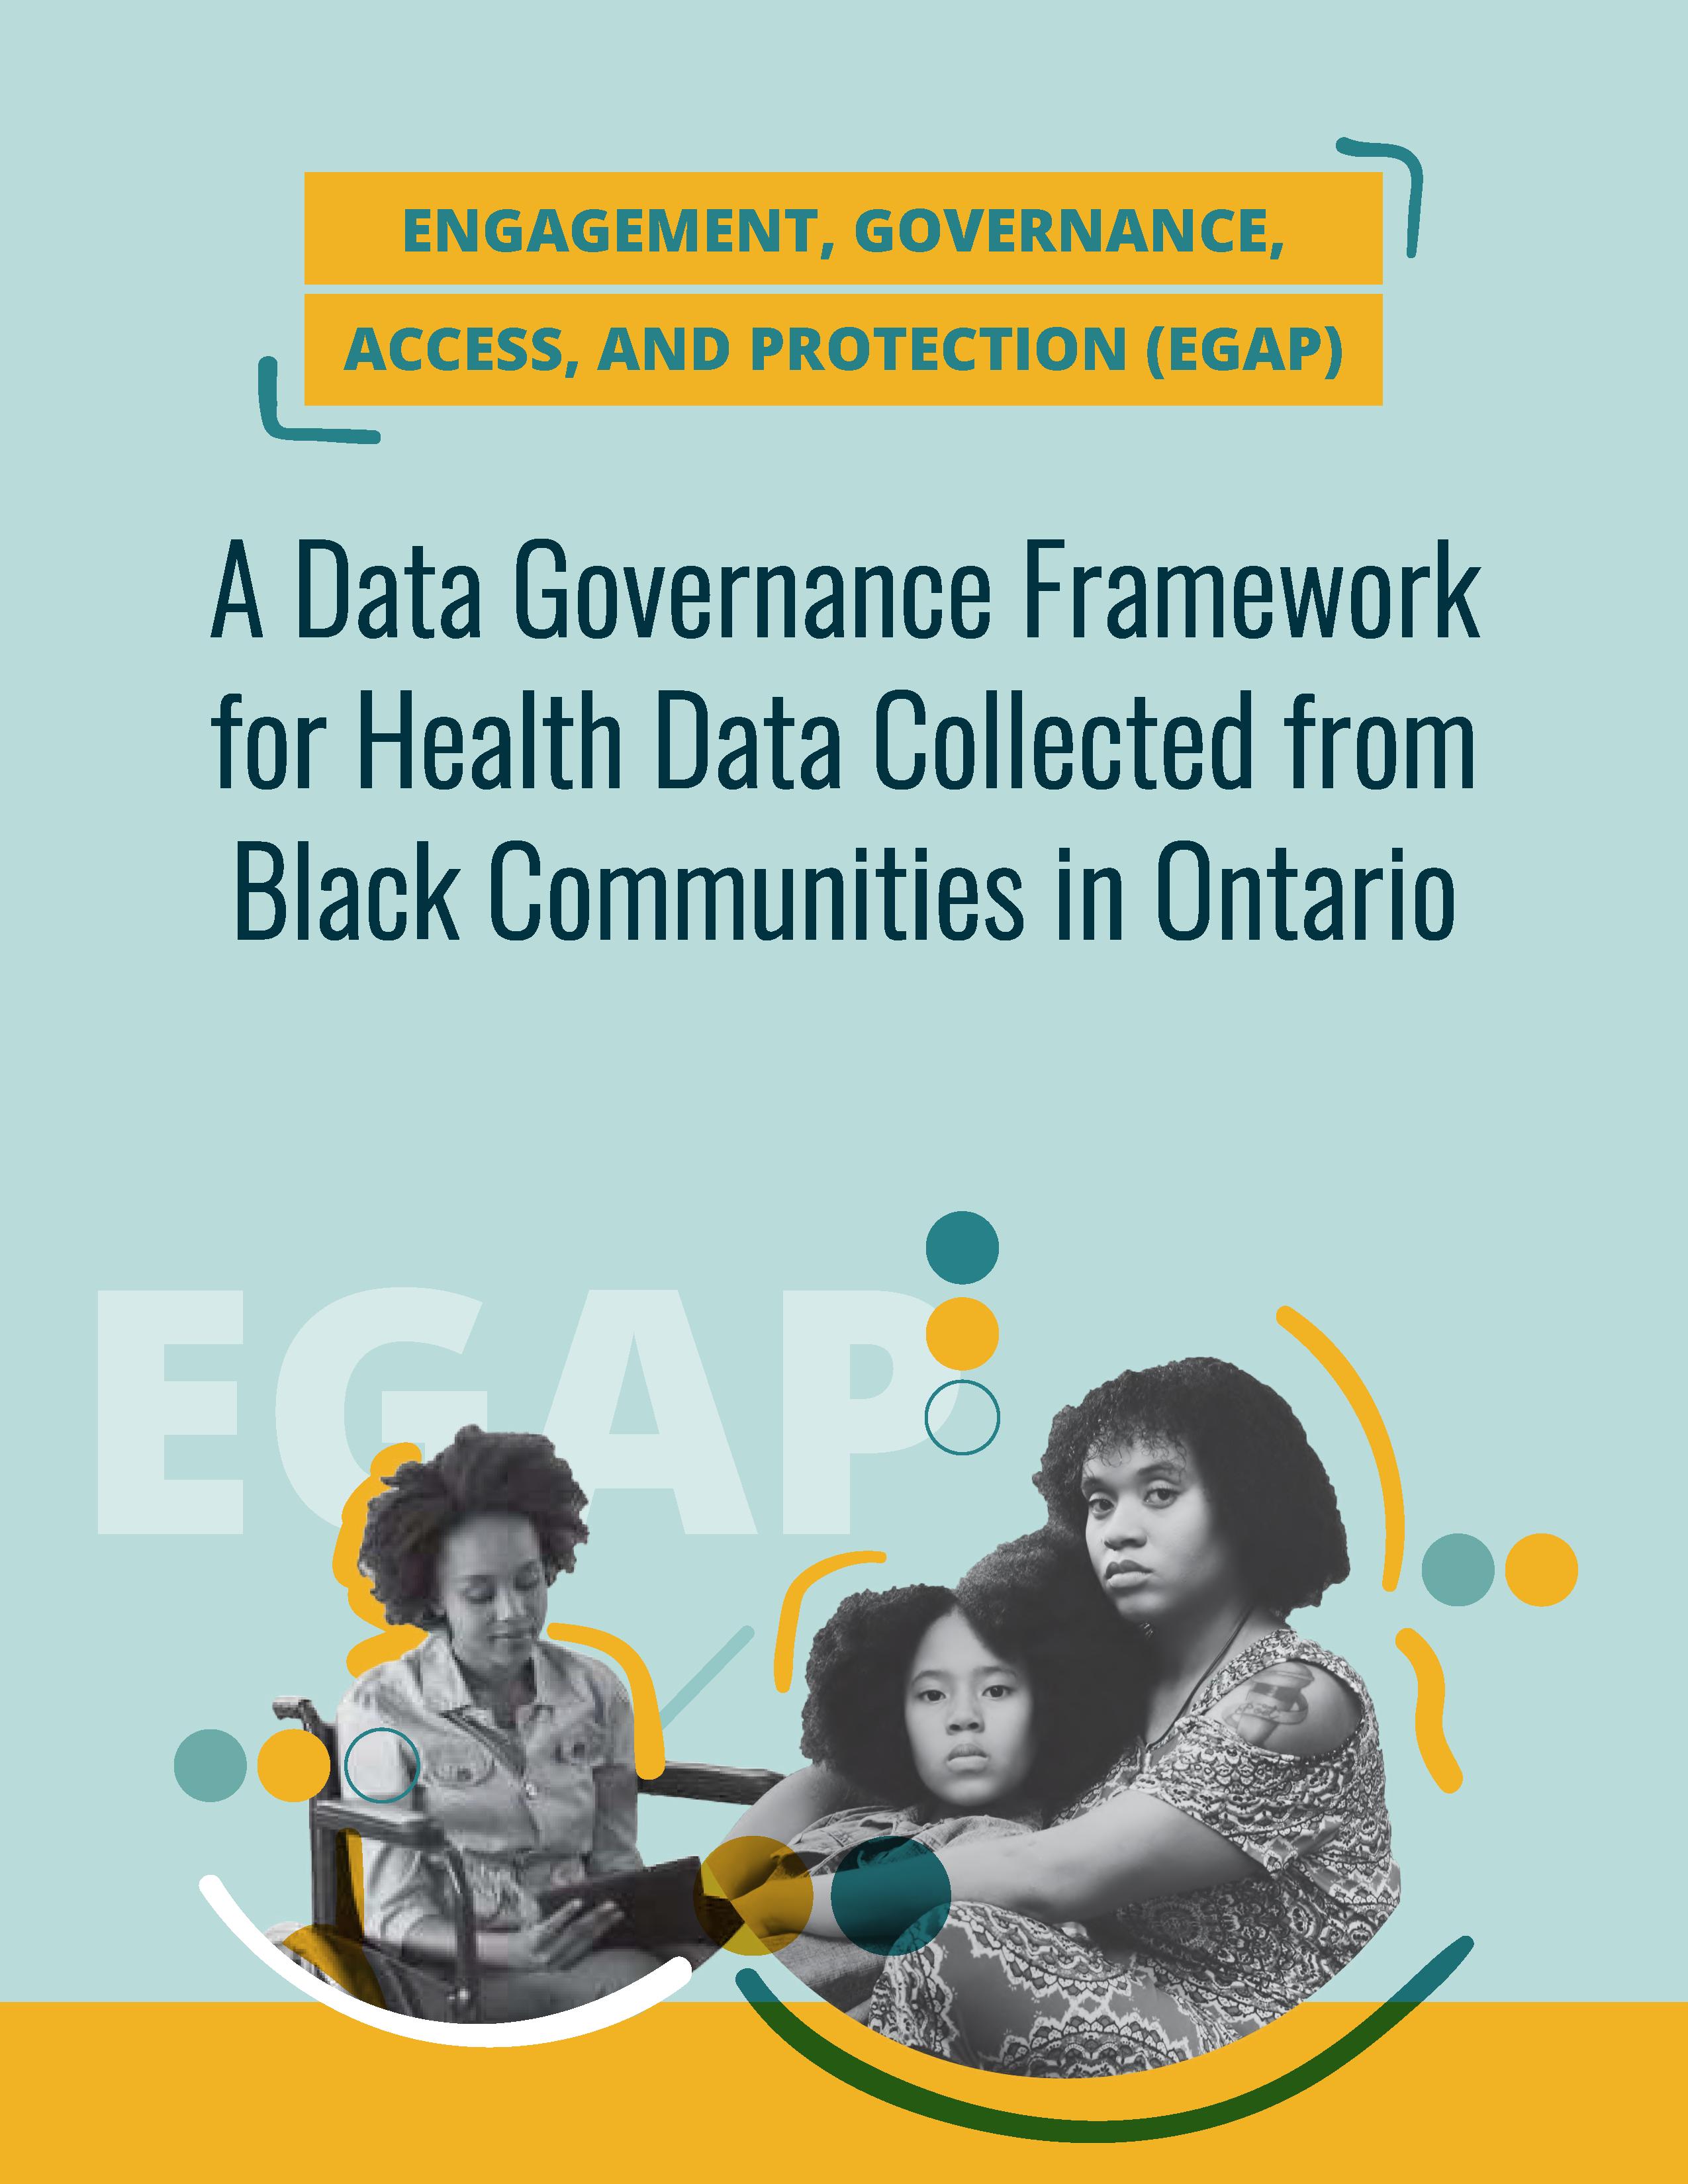 Engagement, governance, access, and protection (EGAP) framework